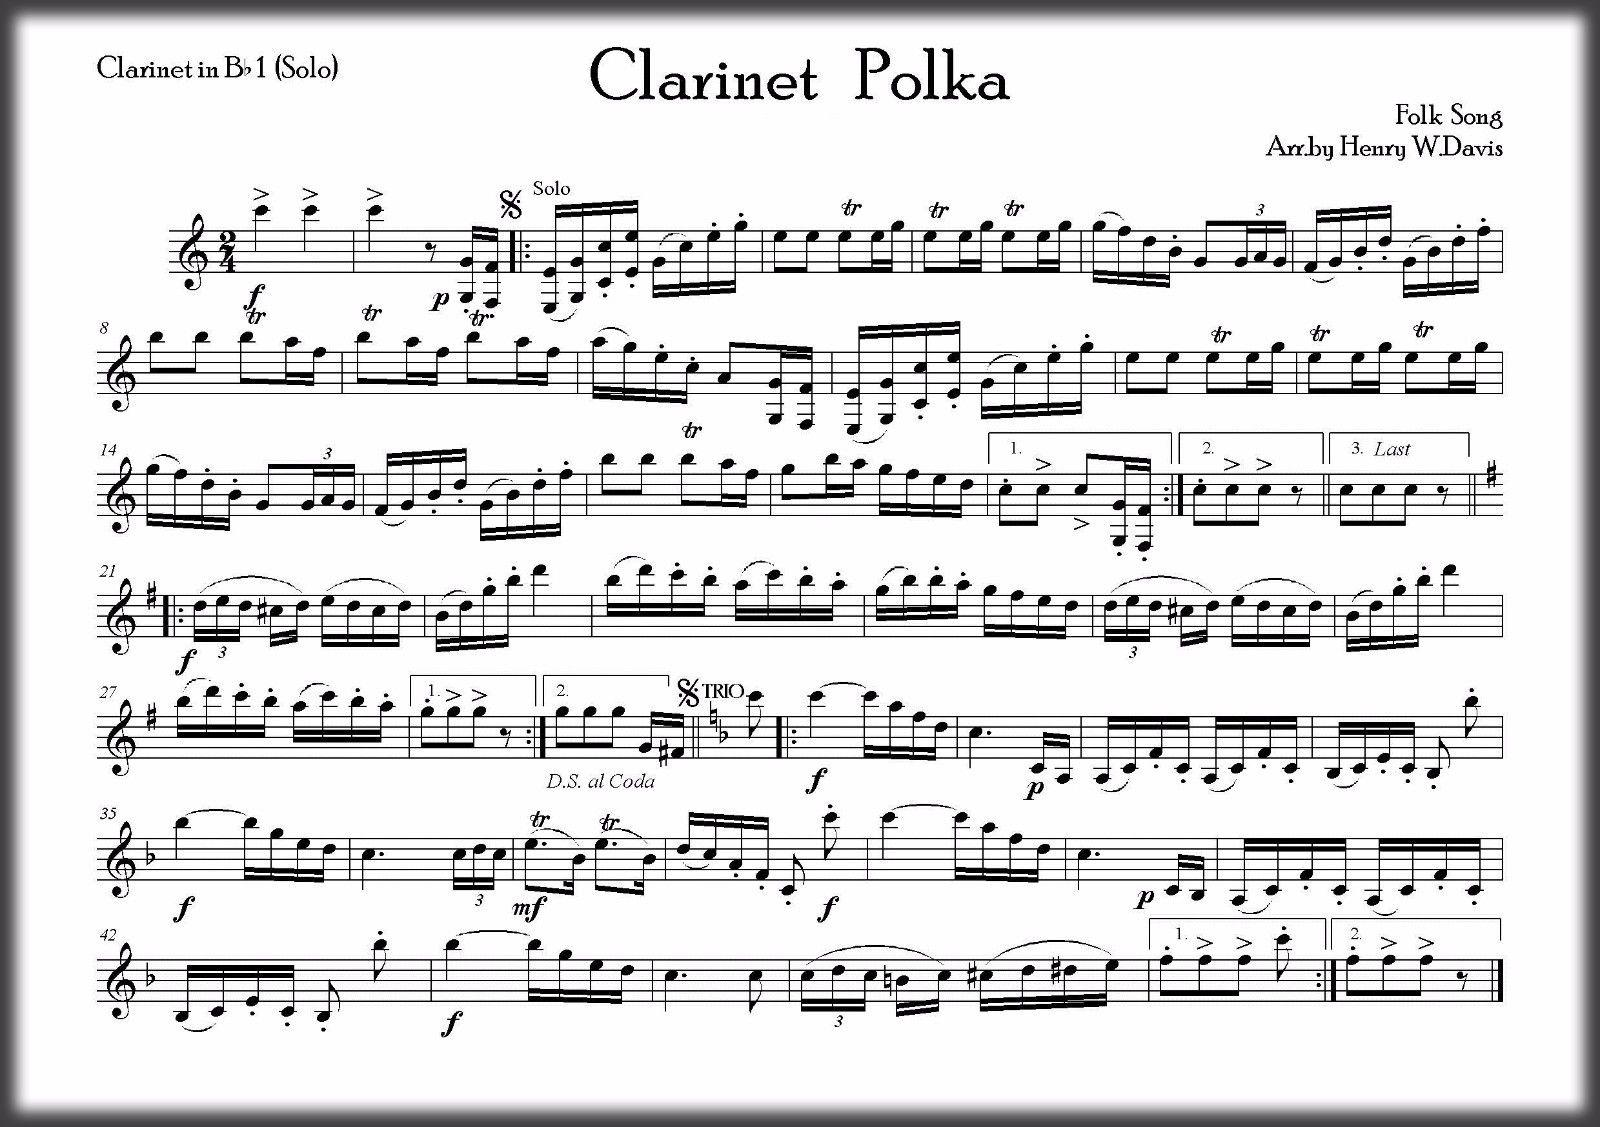 Marching Band Sheet Music - Clarinet polka by Luis F  Boos PDF